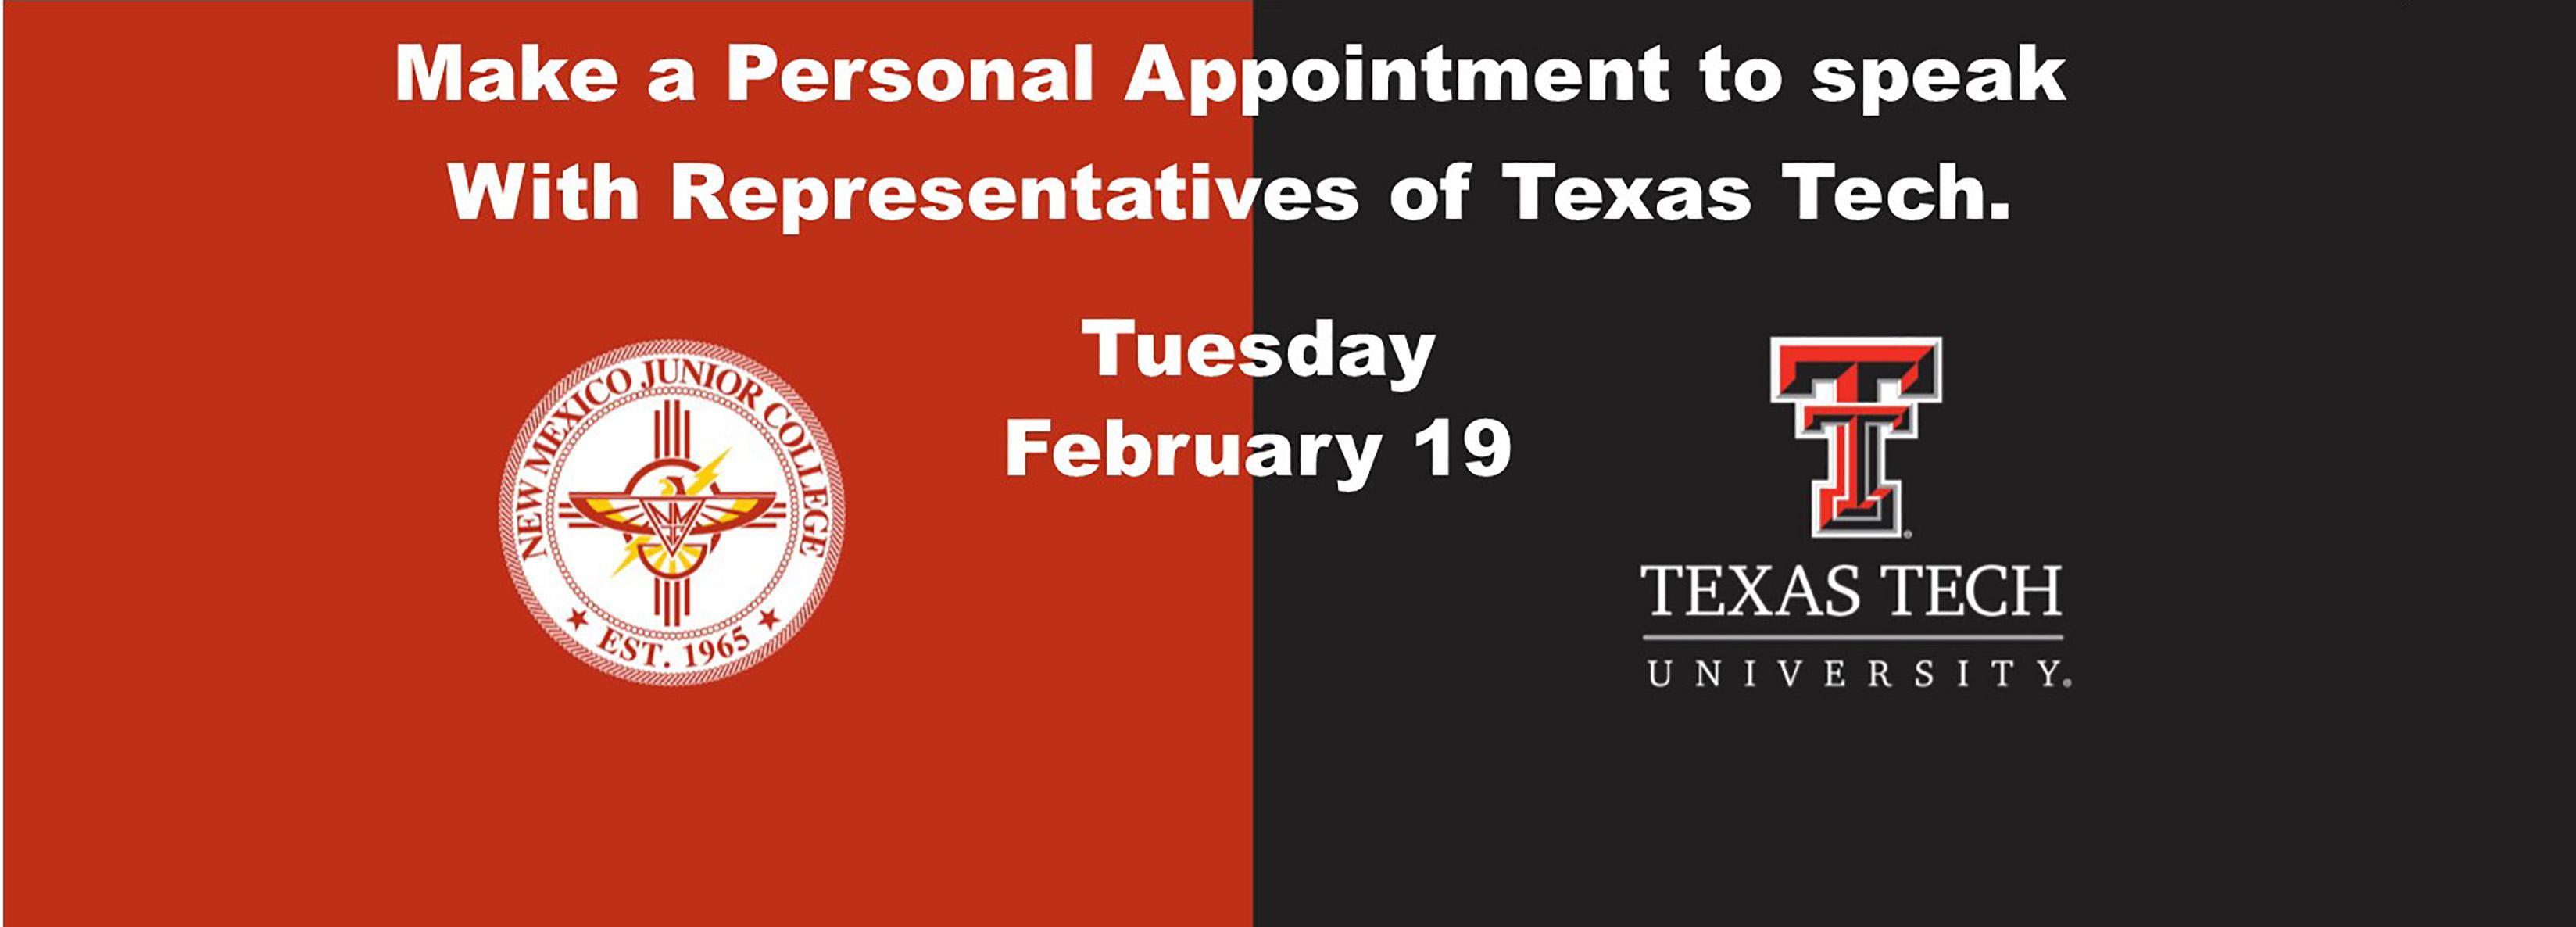 Speak with Texas Tech Tues Feb 19